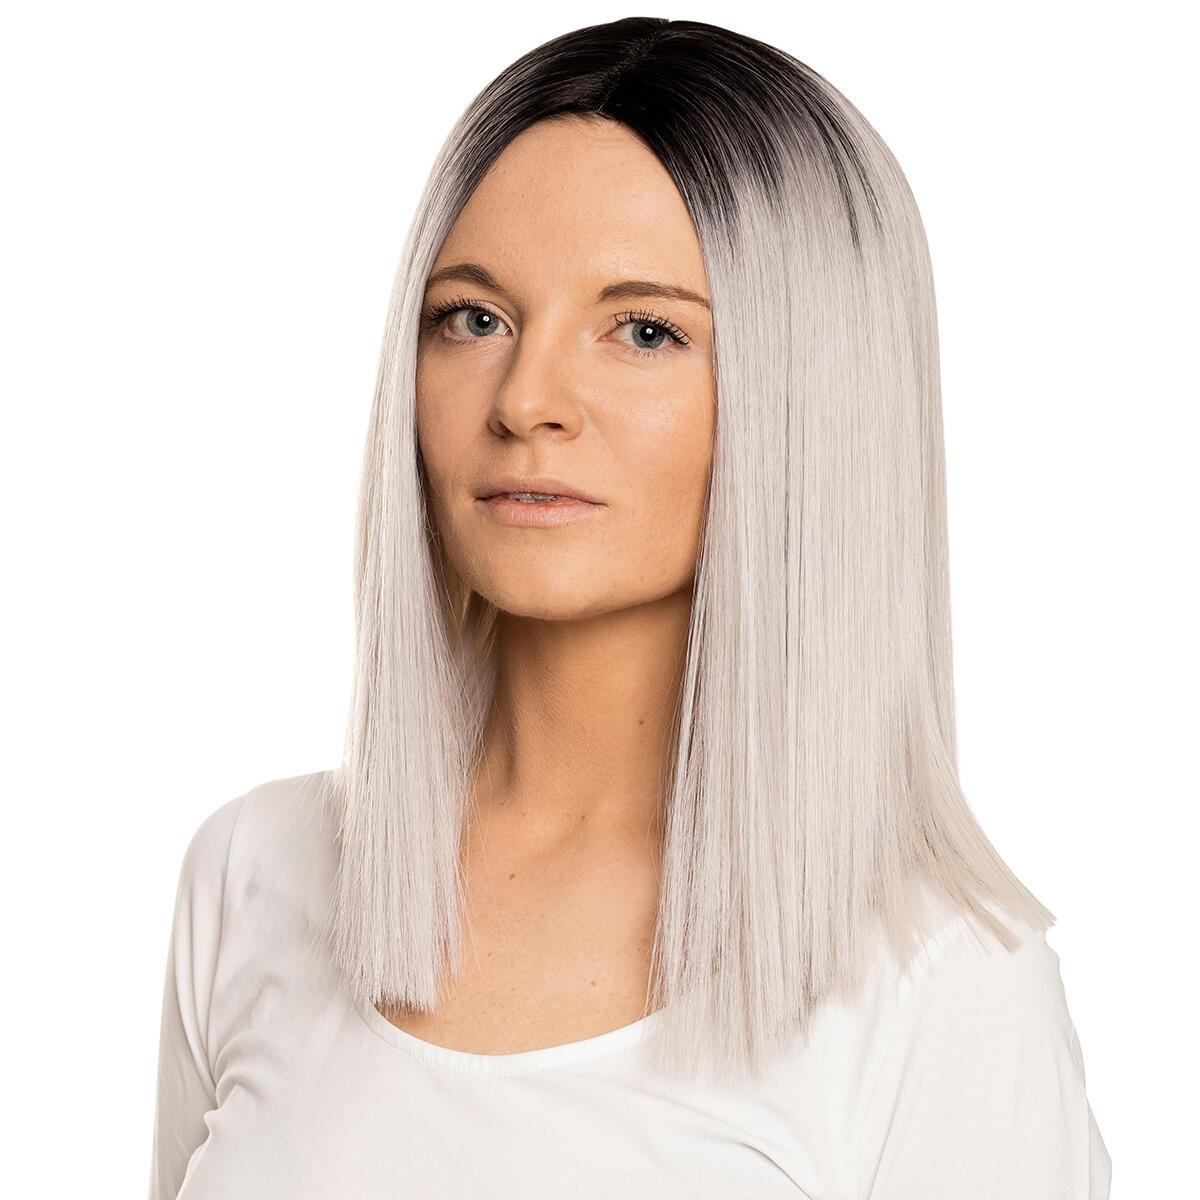 Lace Front Wig O1.2/10.5 Black Brown/Grey 35 cm